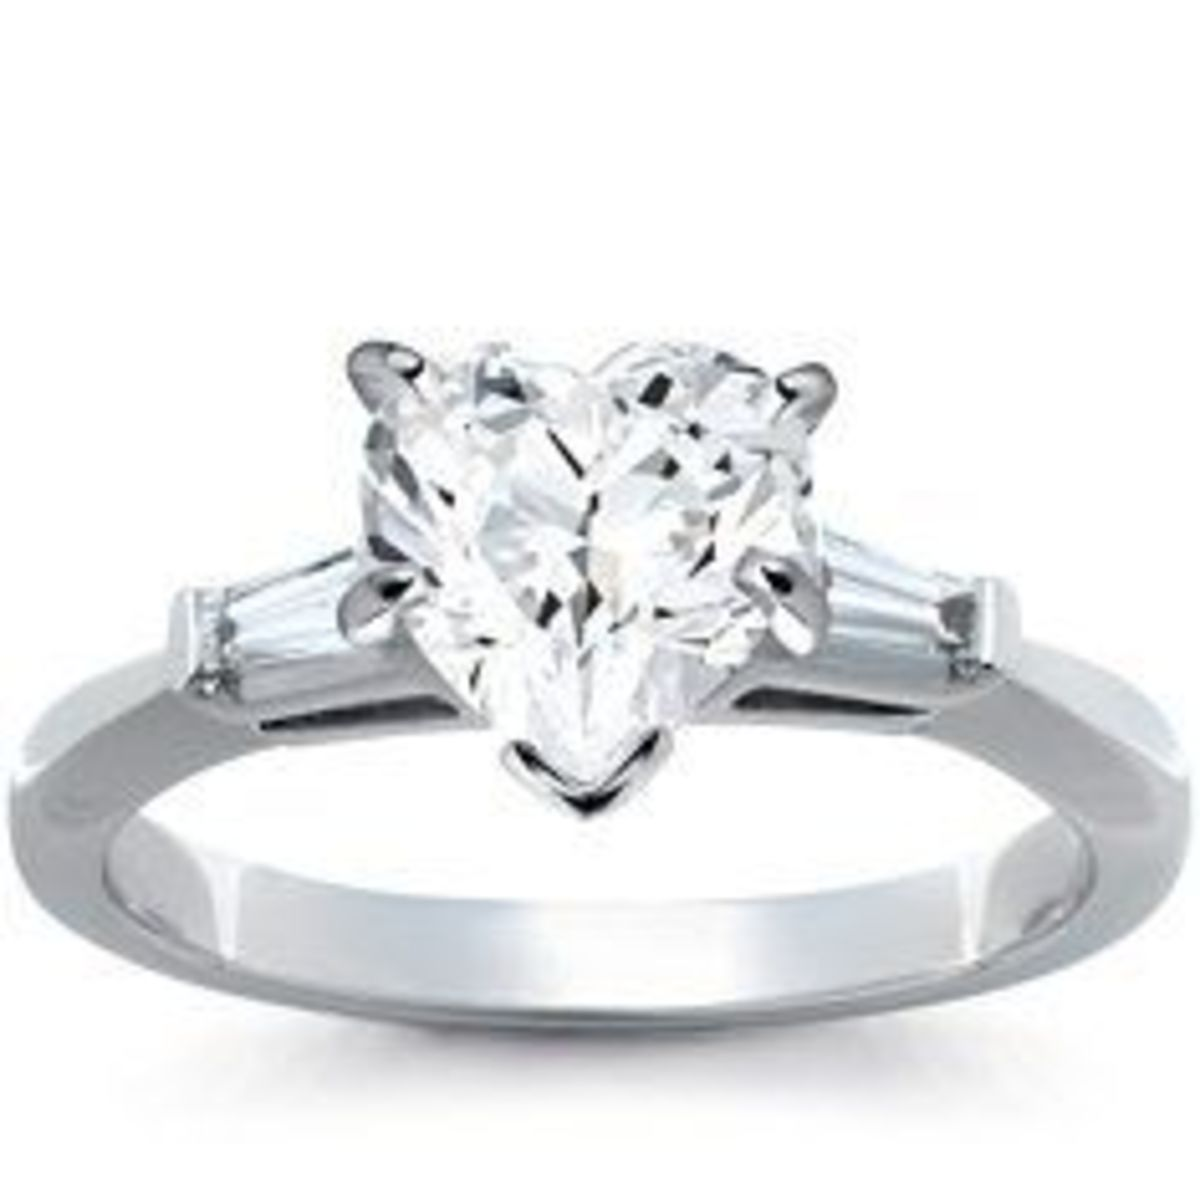 James Allen heart shaped diamond in tapered baguette setting